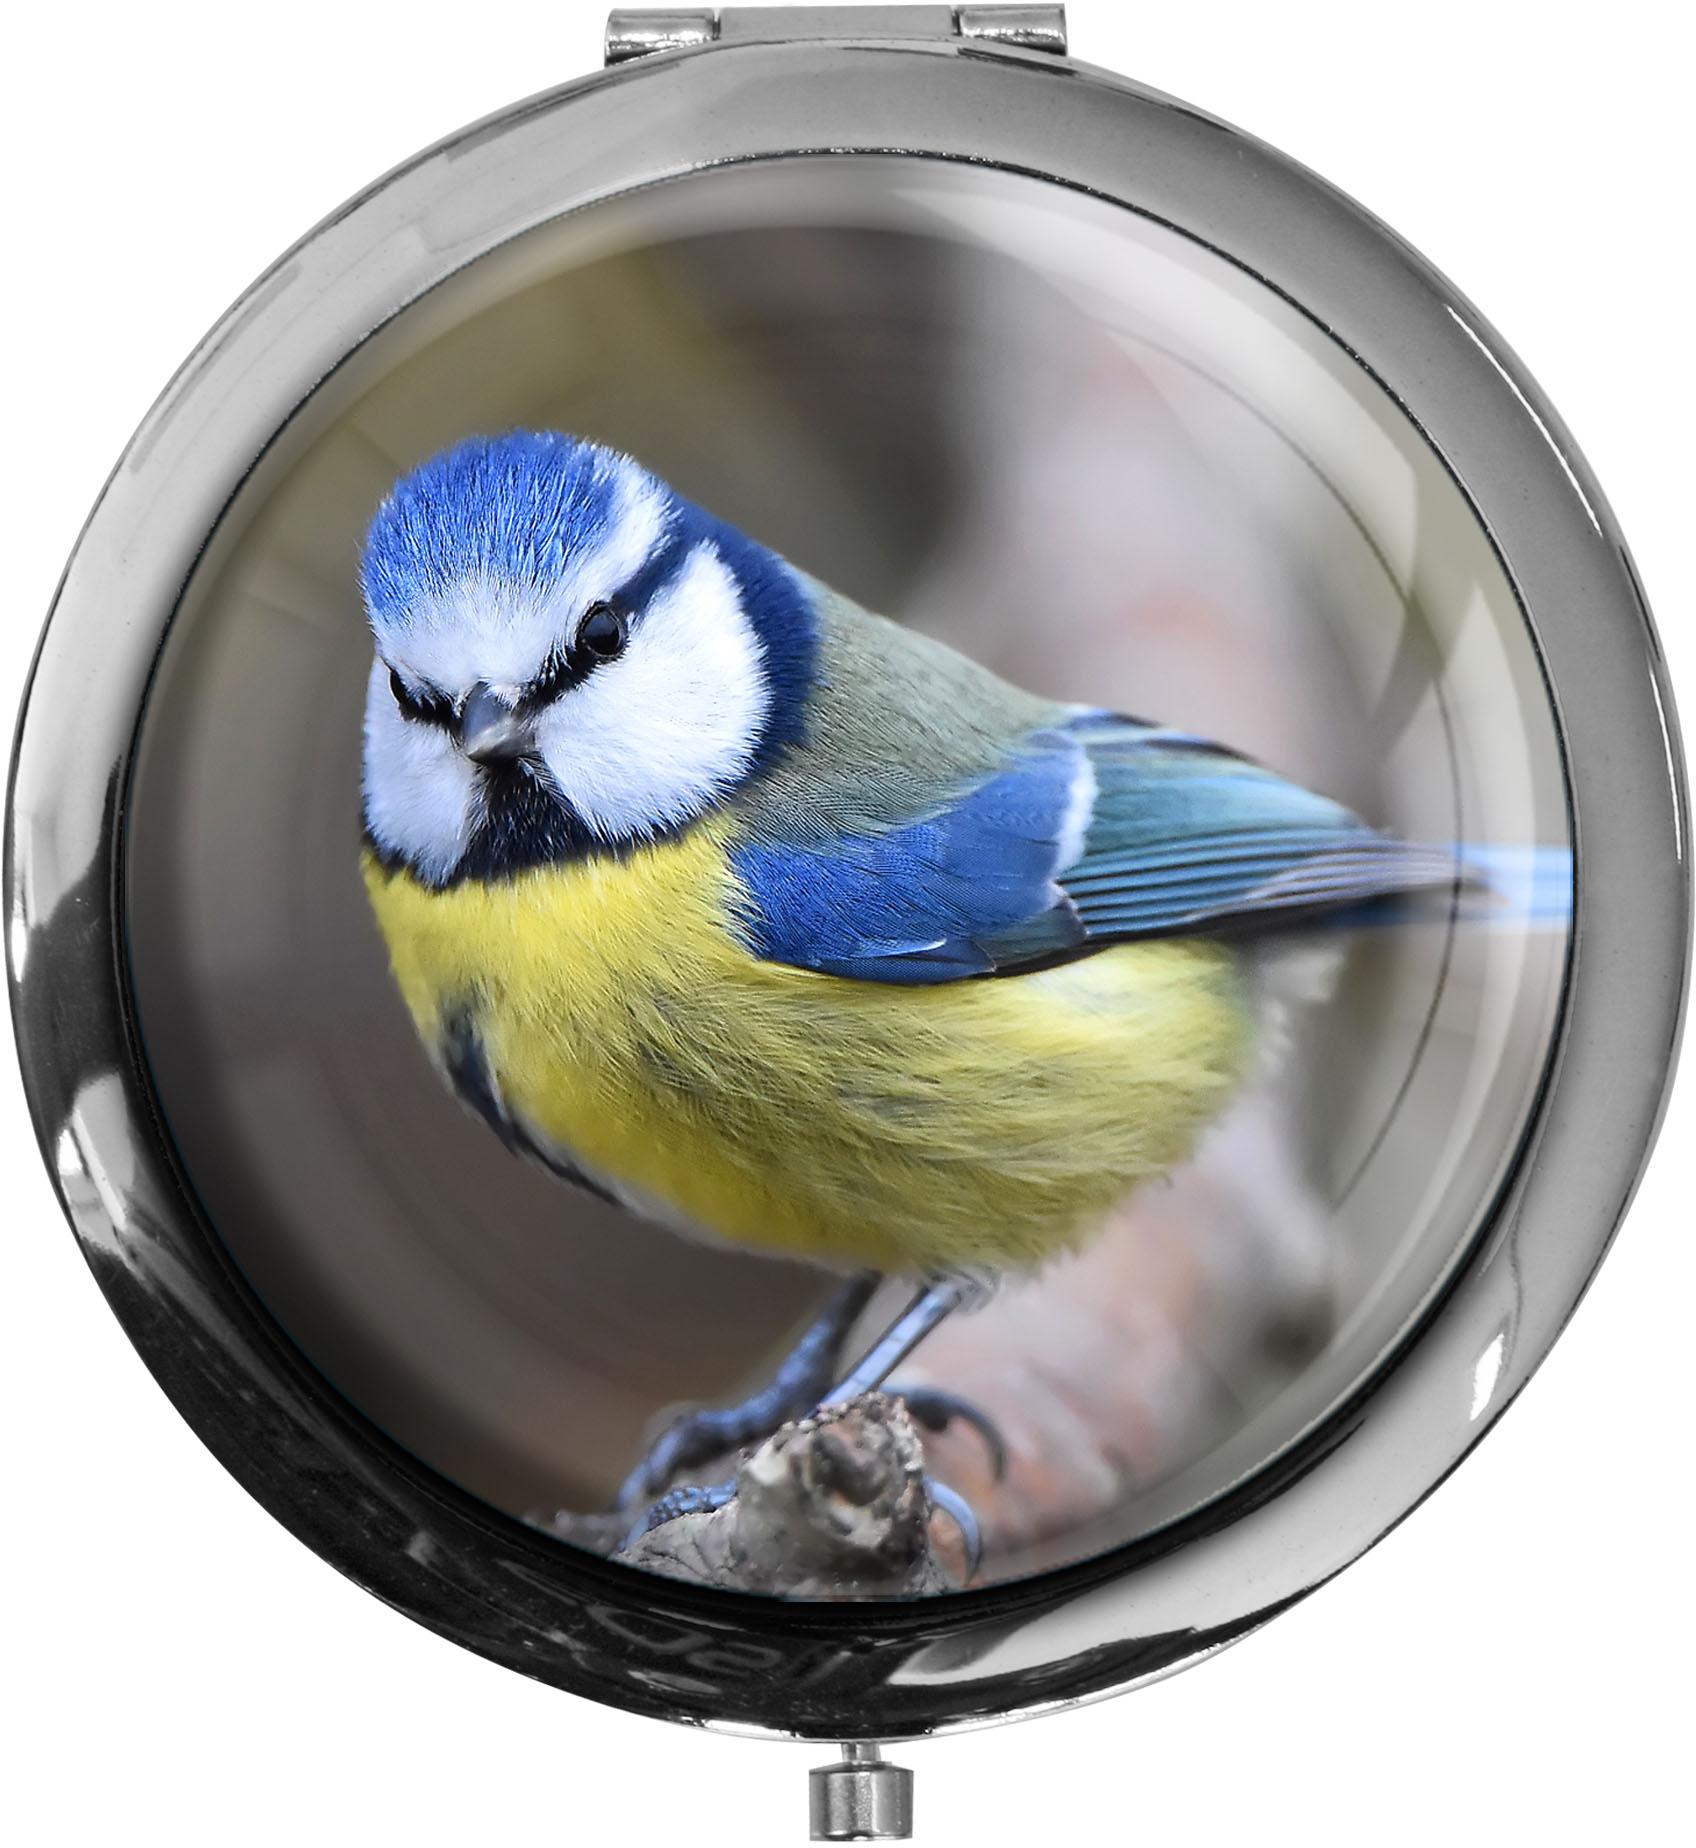 Pillendose XXL / Meise / Vögel